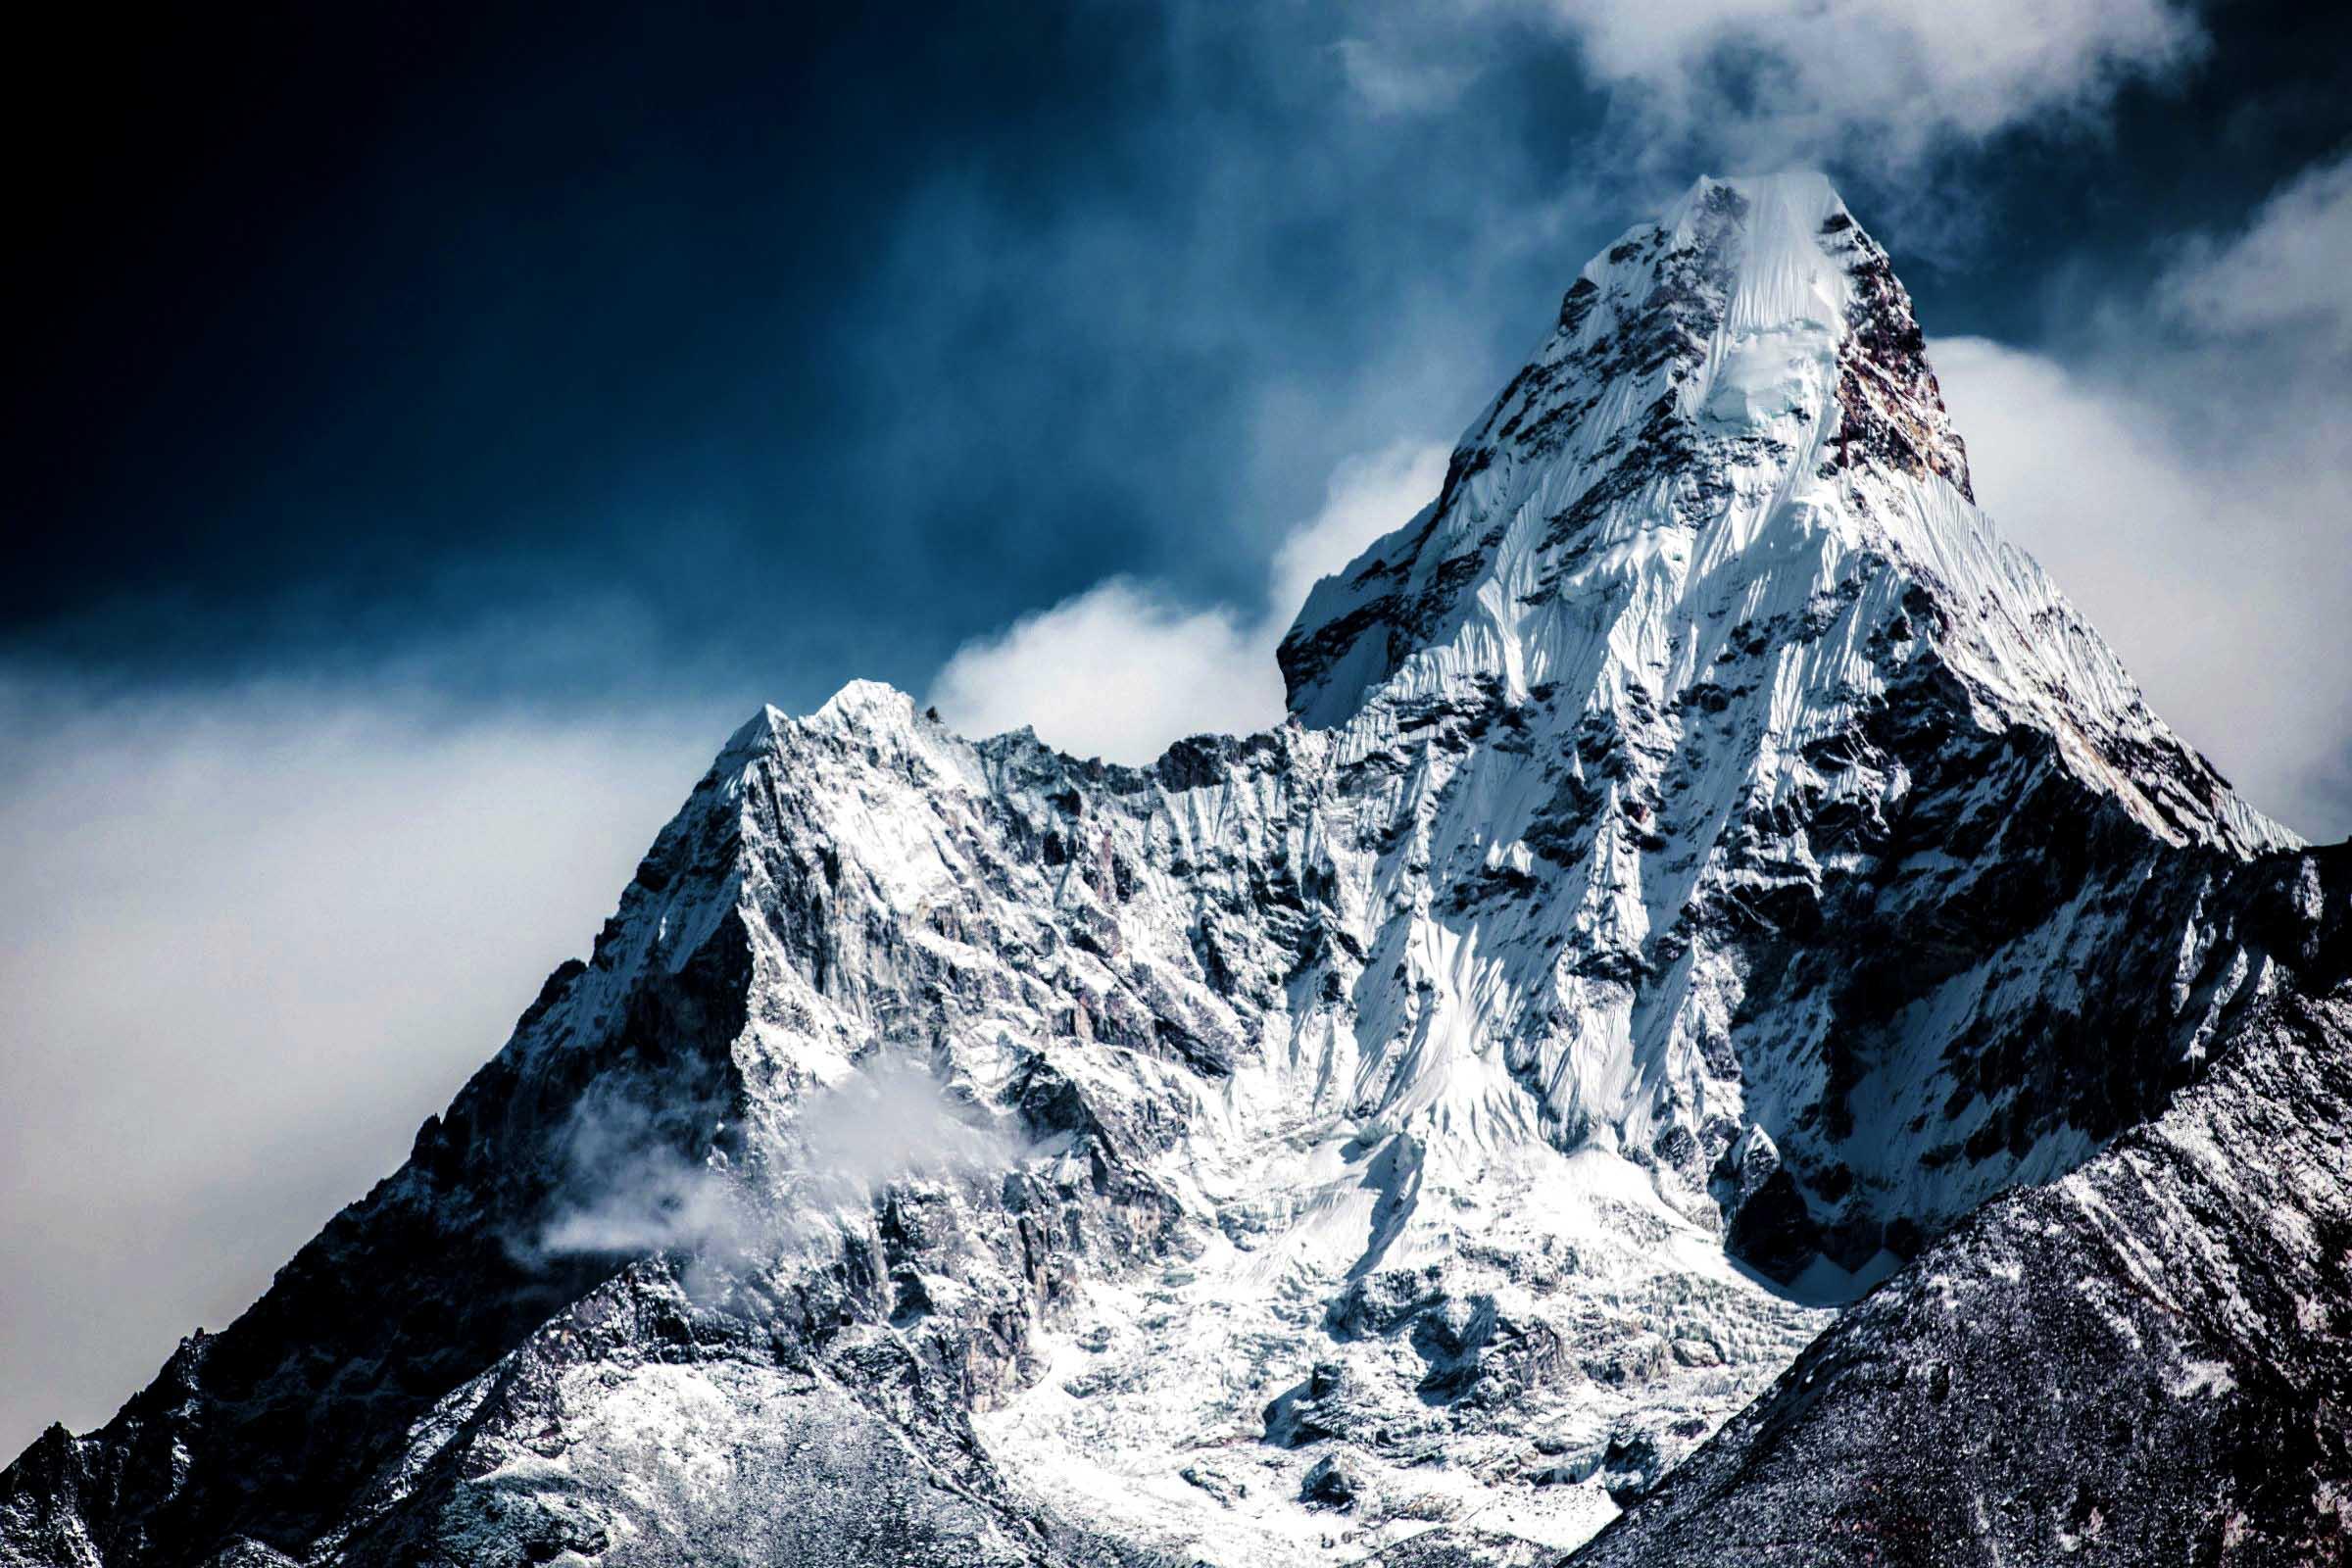 Everest Base Camp Trekking, everest view trek, super everest comfort trek